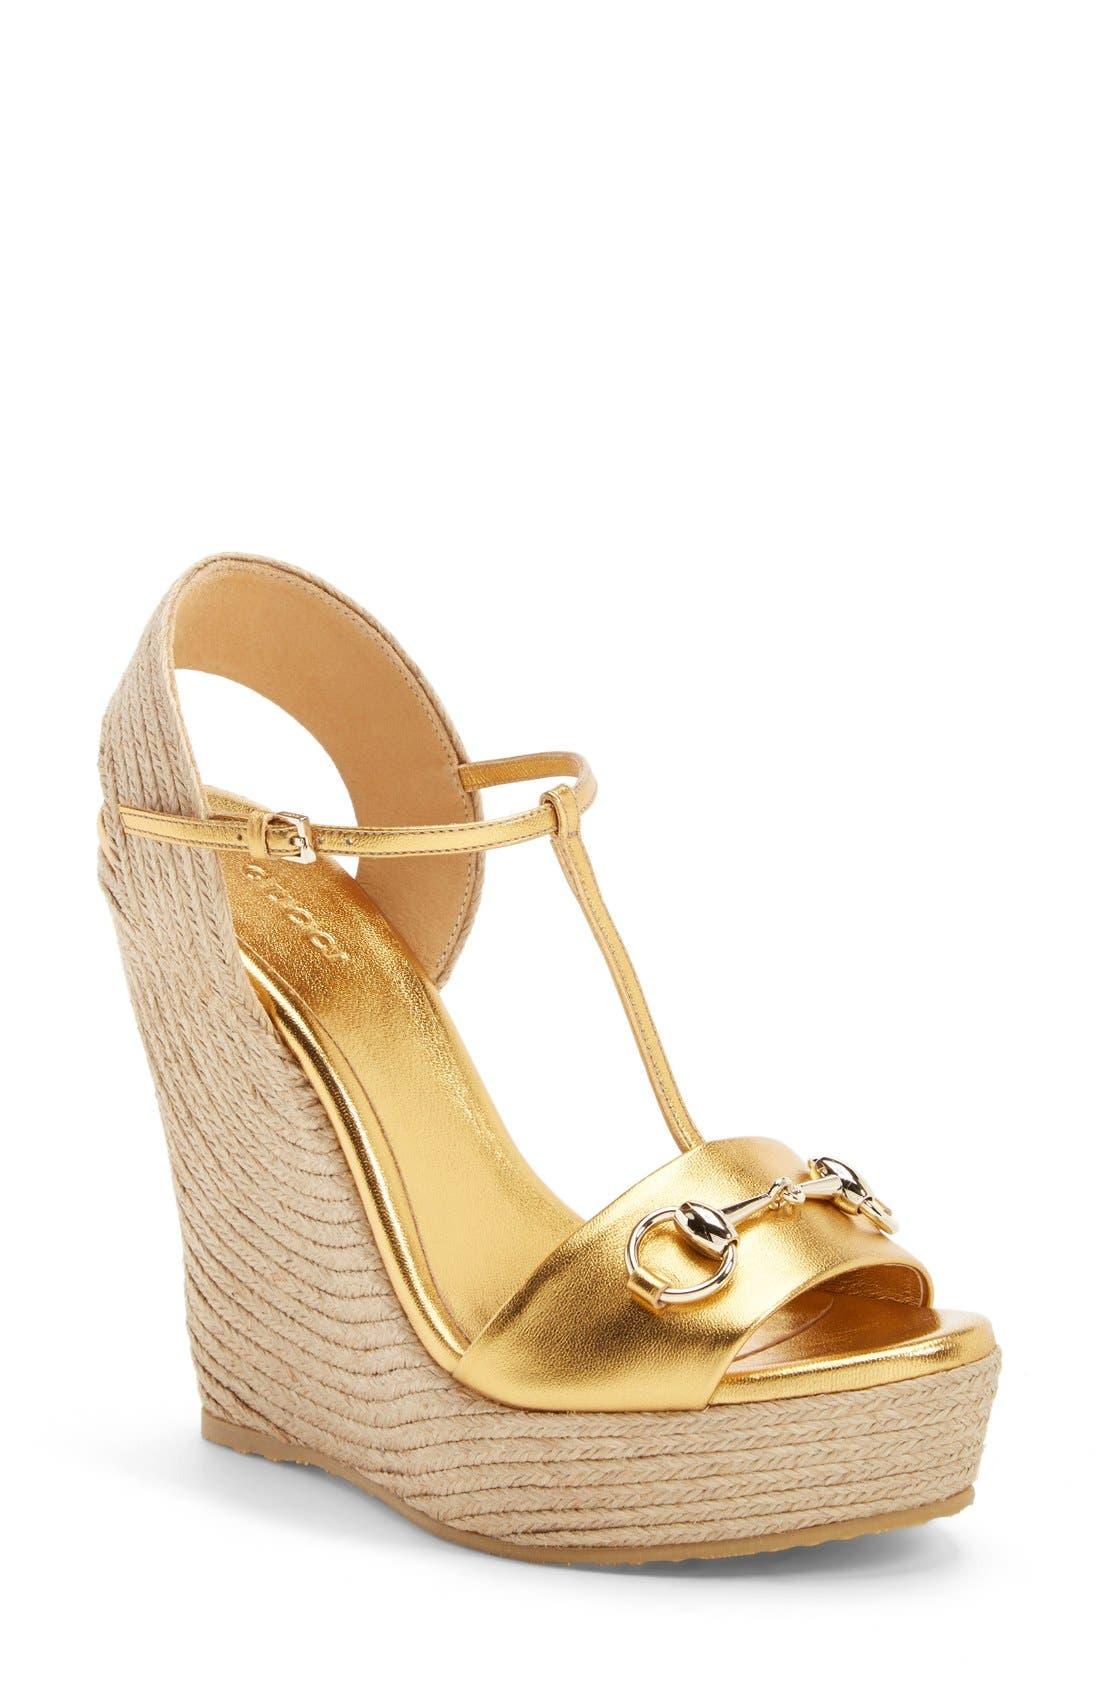 Main Image - Gucci 'Rafia' T-Strap Wedge Sandal (Women)